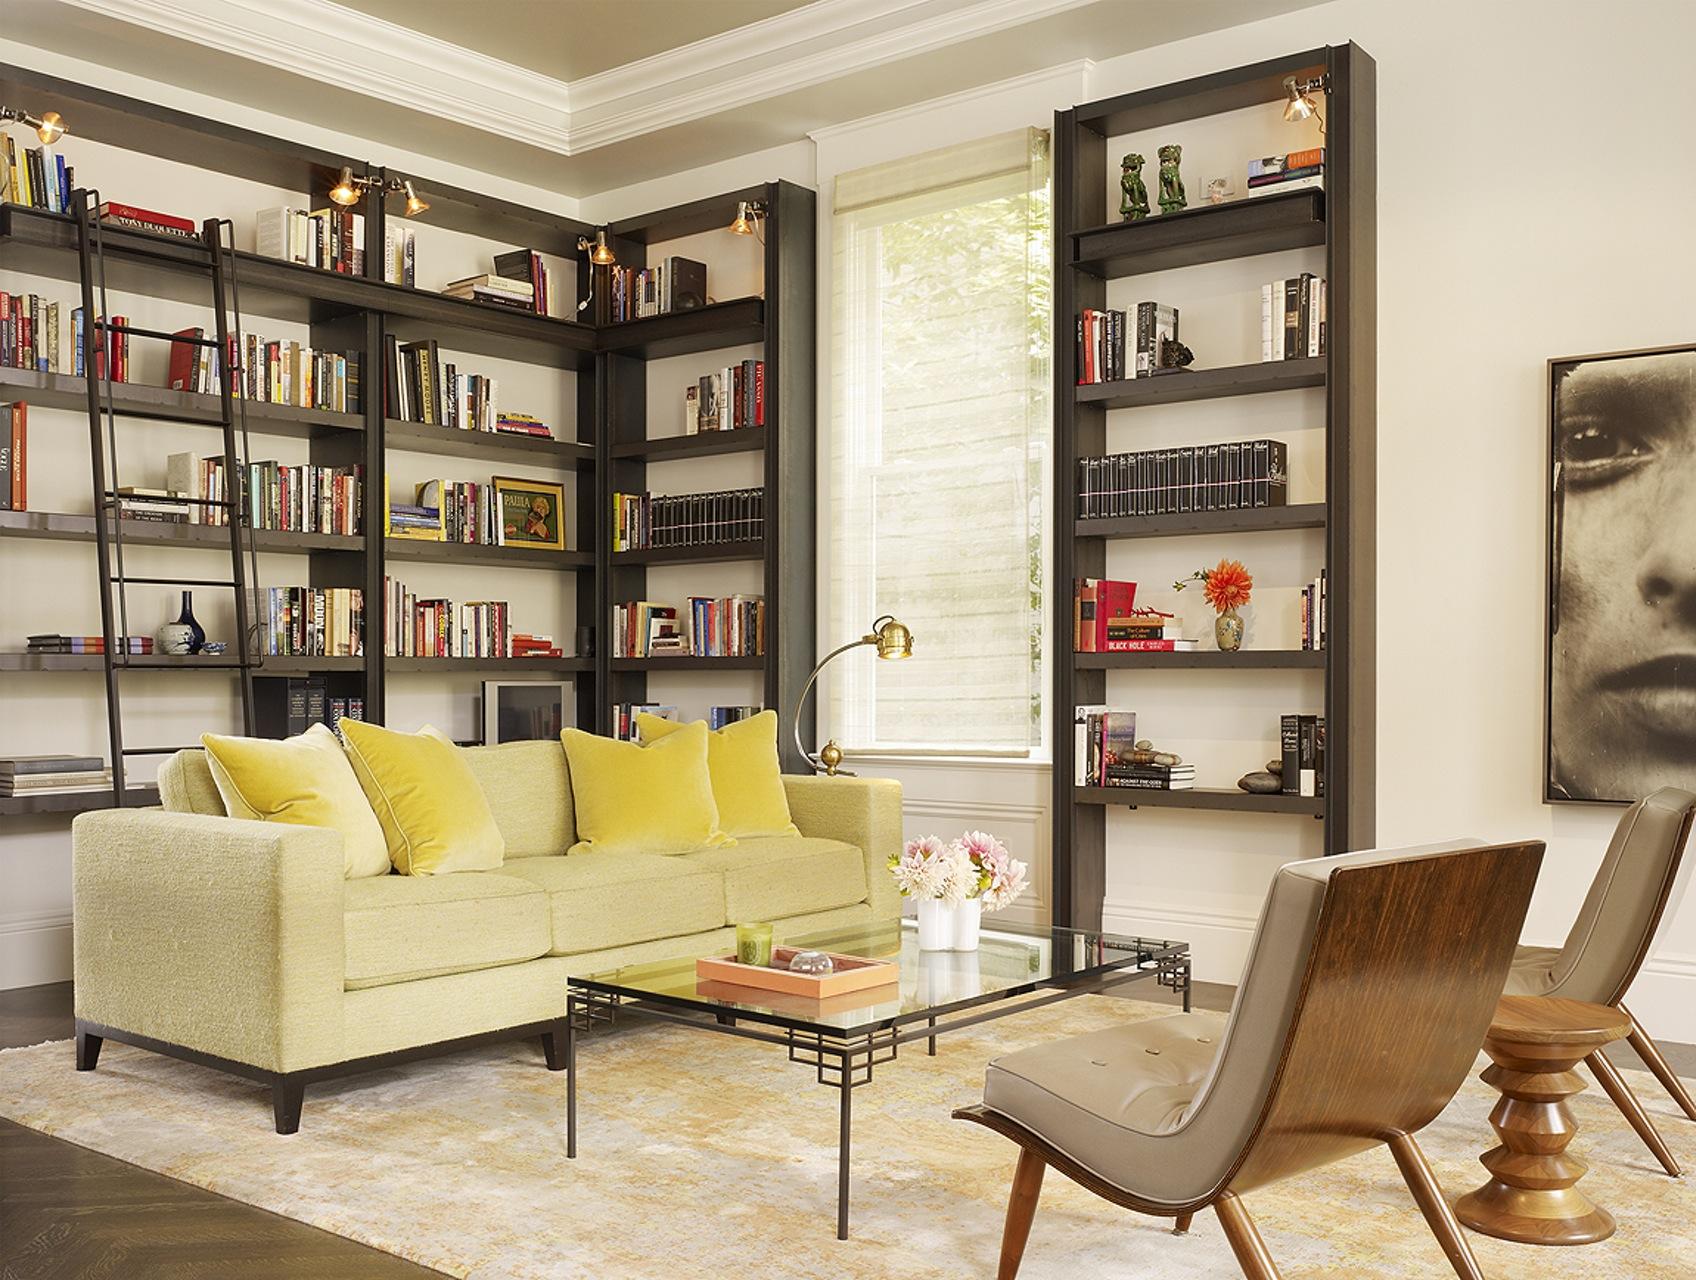 redmond-aldrich-design-portfolio-interiors-modern-transitional-library-living-room.jpg